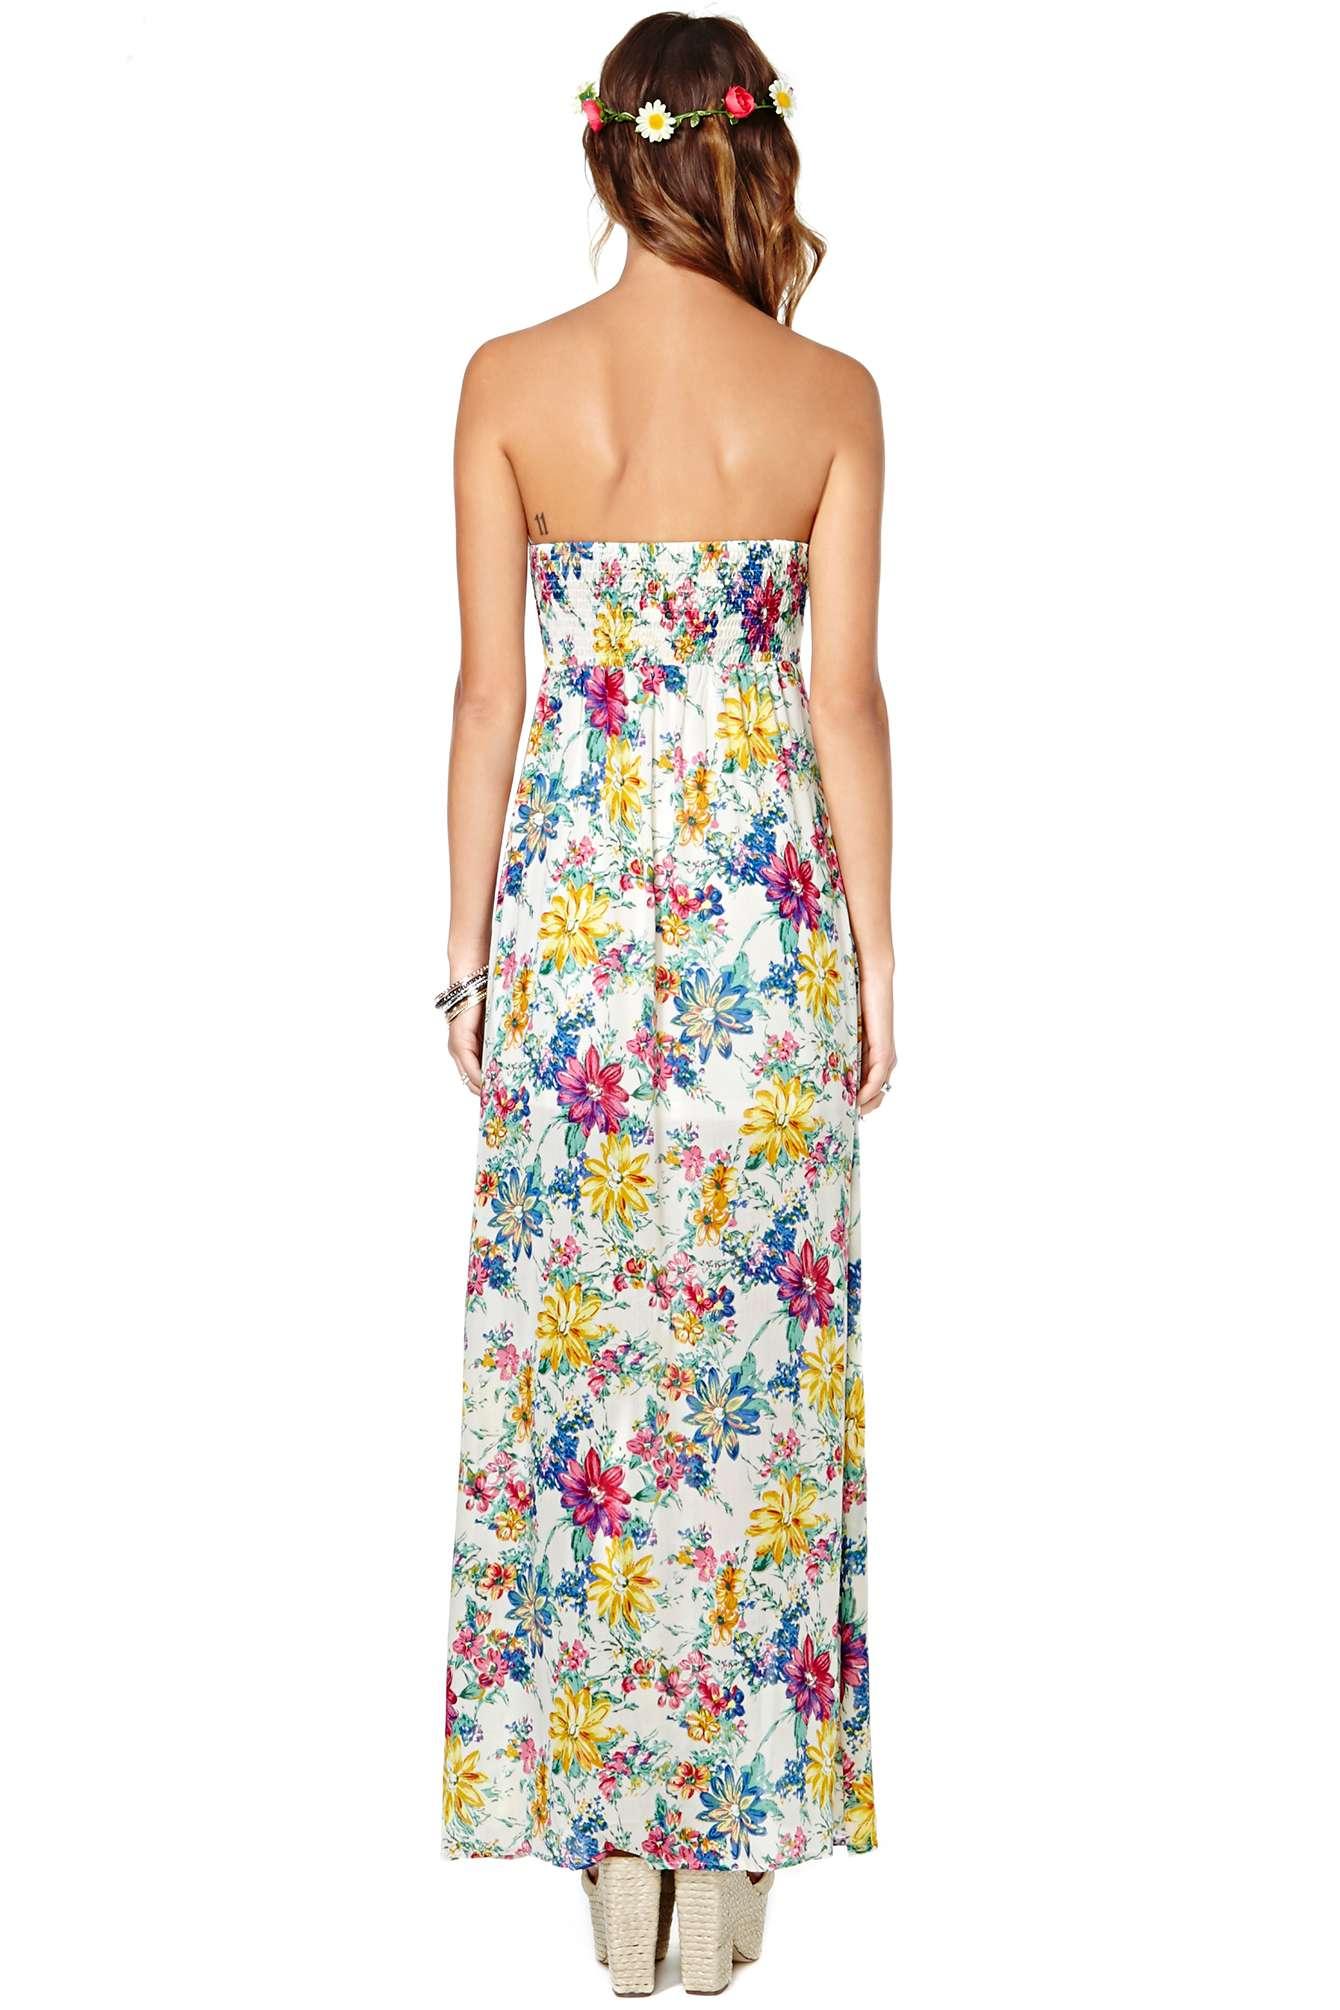 Nasty Gal Reverse Secret Garden Dress Lyst